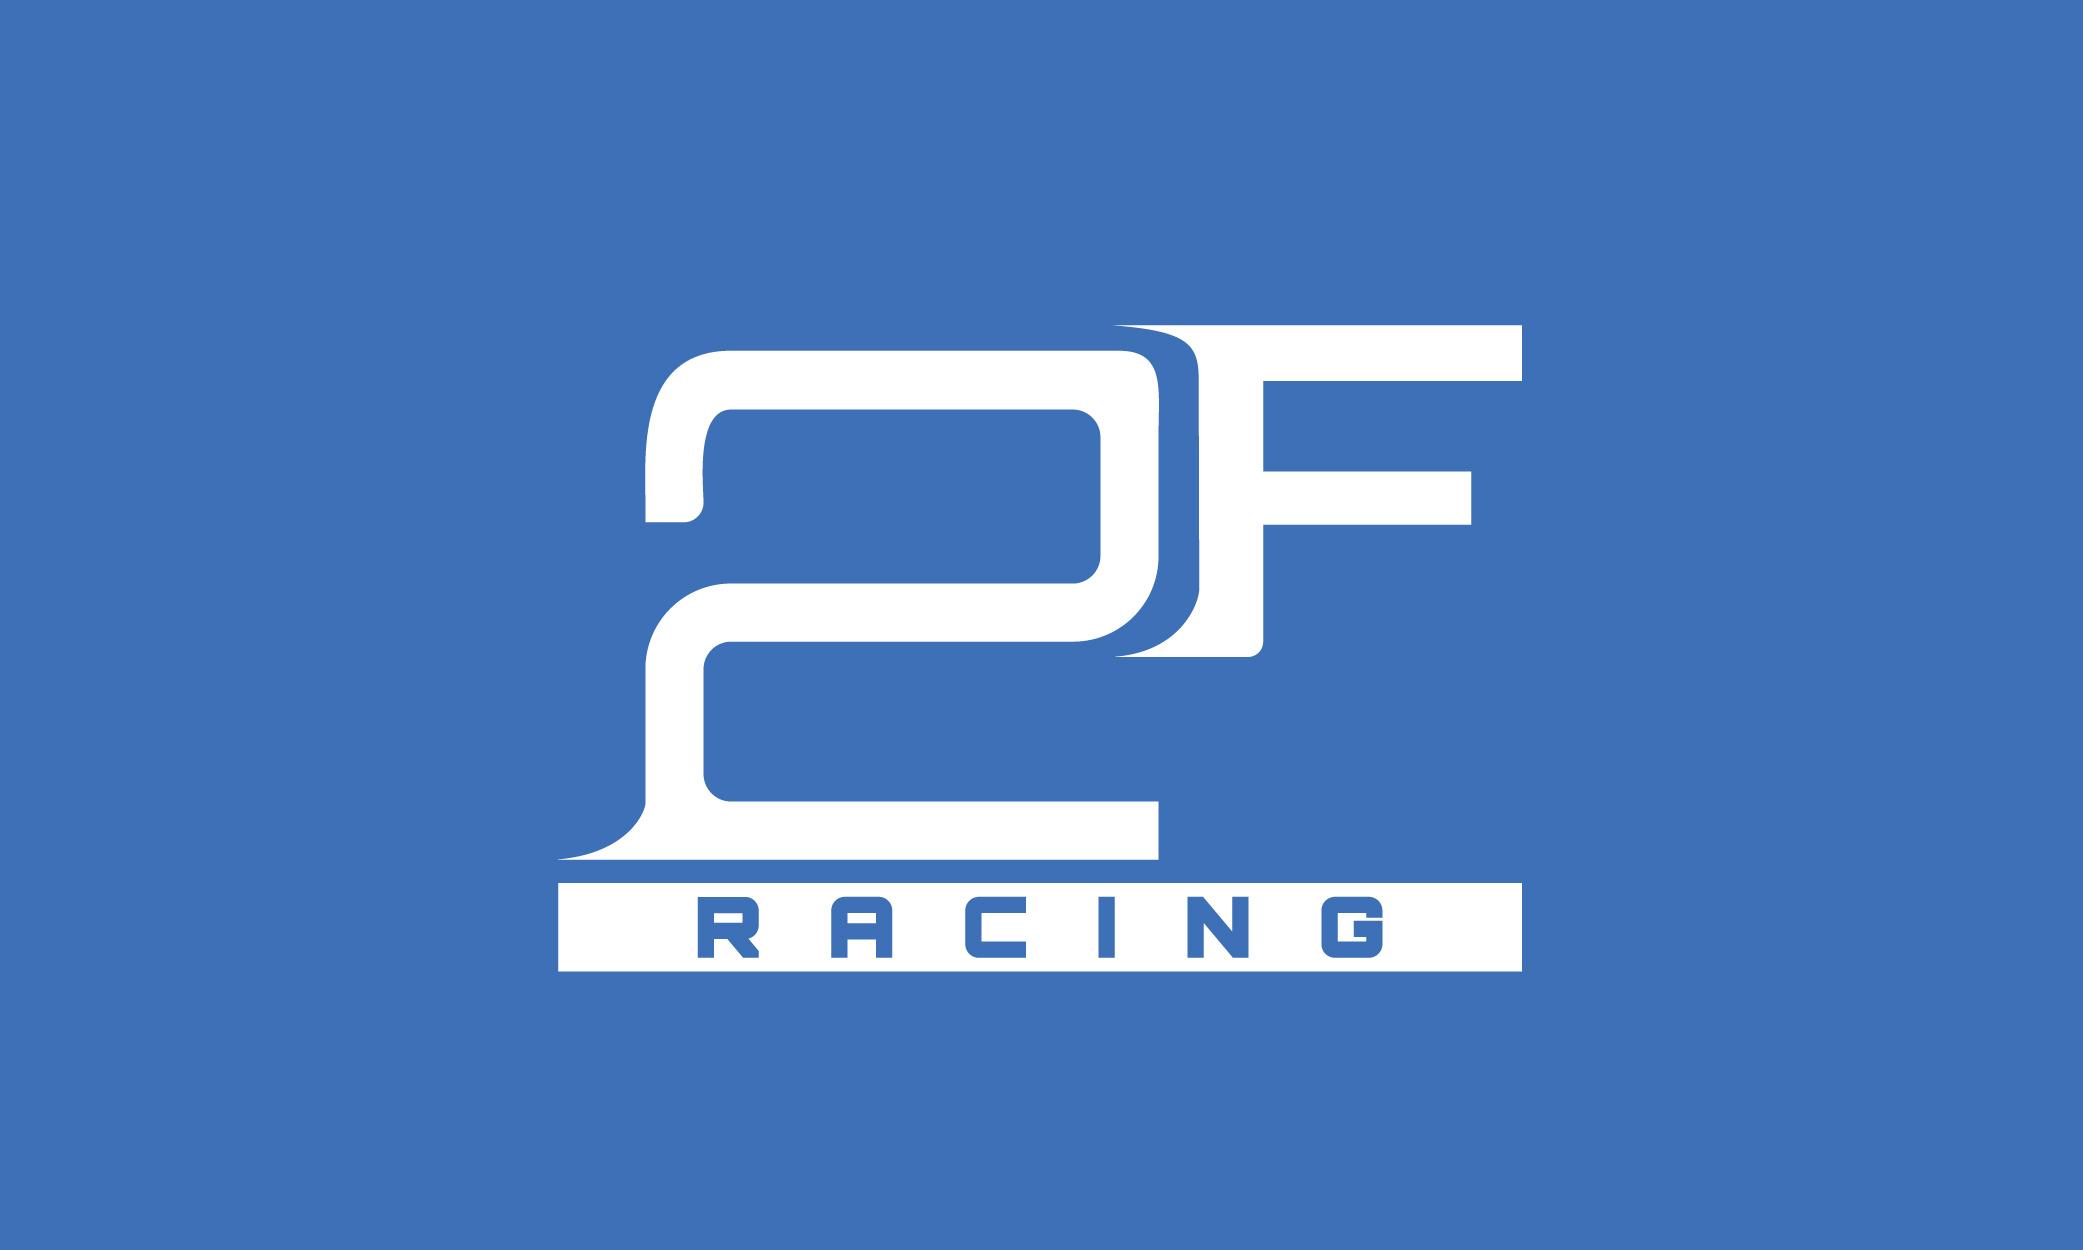 2FRacing Logo design